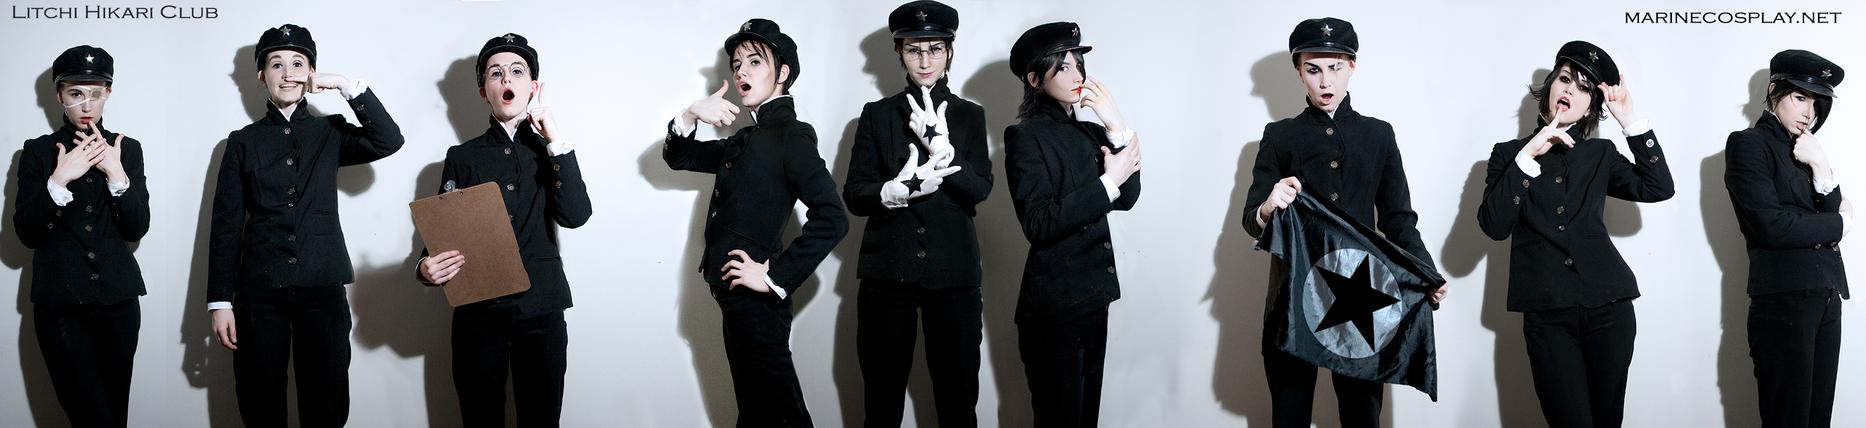 Litchi Hikari Club cosplay -whole group Makeup lab by marinecosplaybr